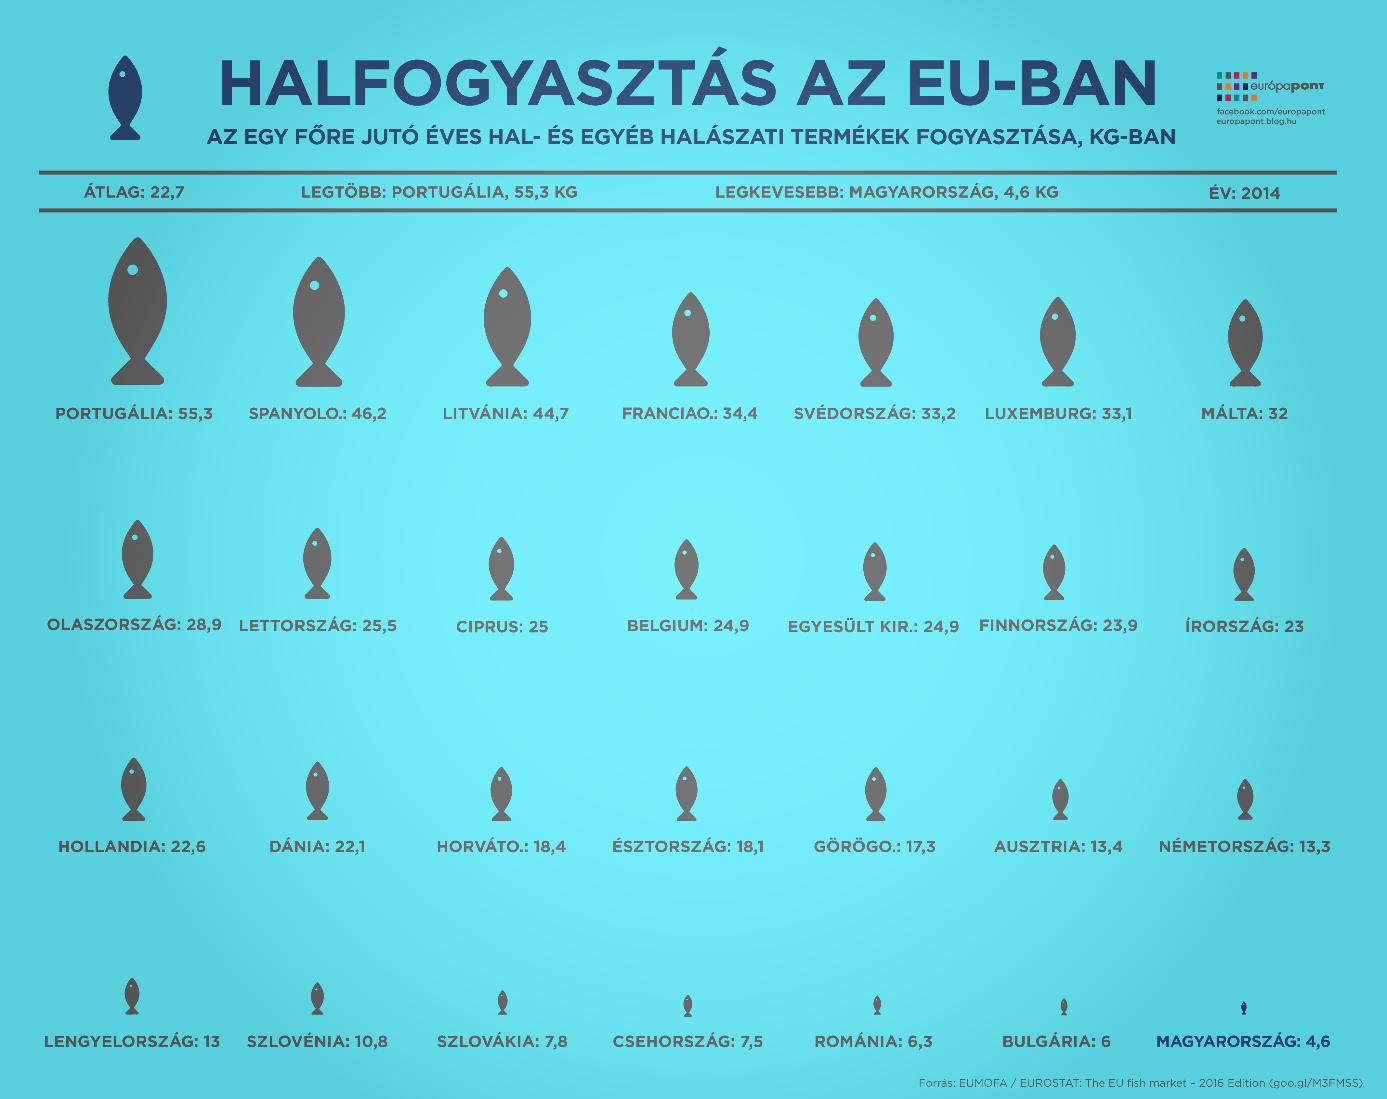 ildafit_hal_2.png